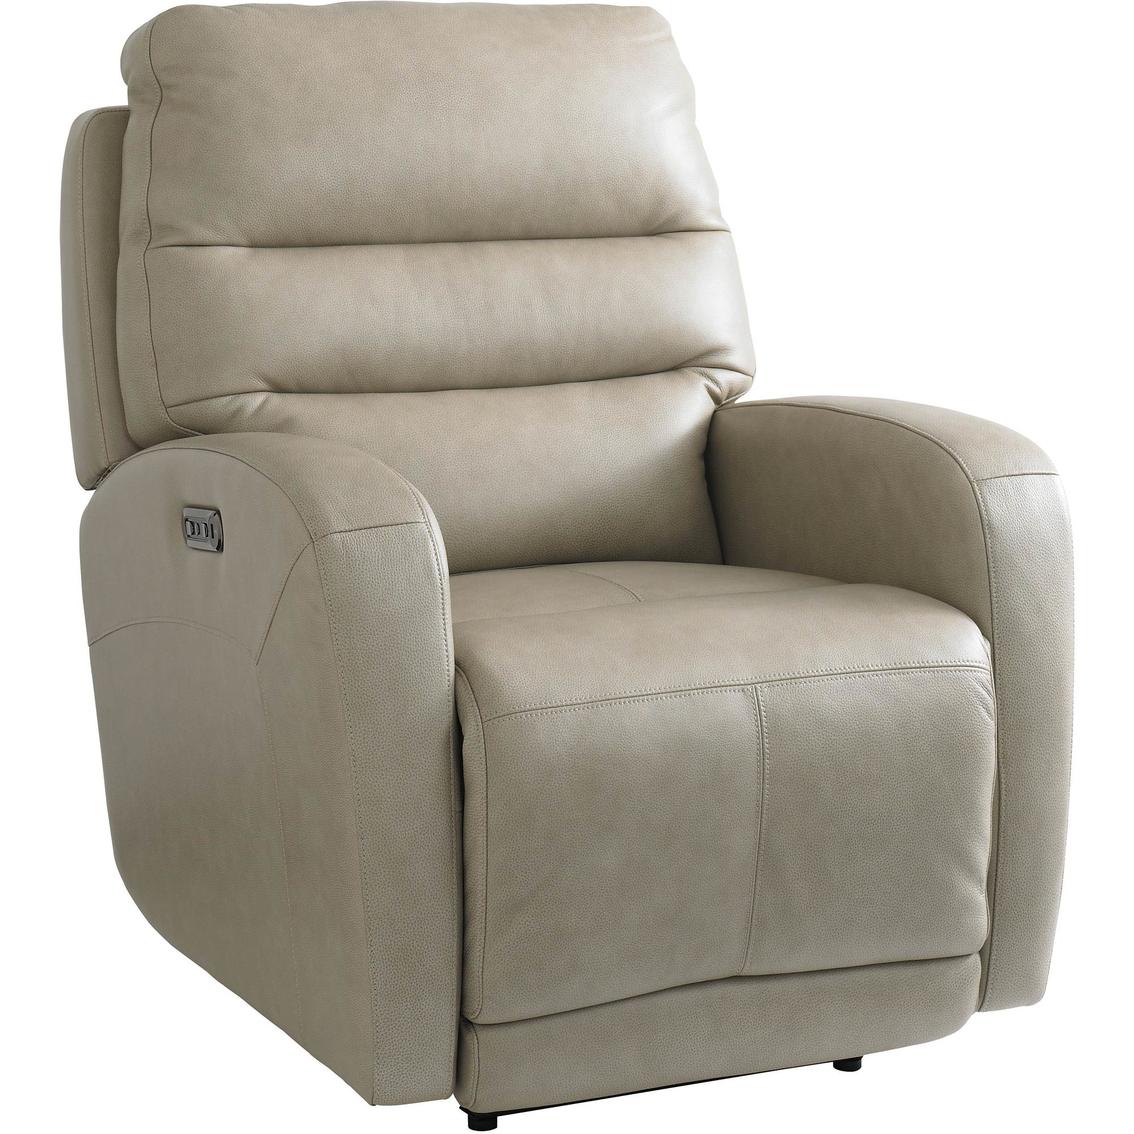 Surprising Bassett Club Level Rodgers Wallsaver Recliner Chairs Machost Co Dining Chair Design Ideas Machostcouk